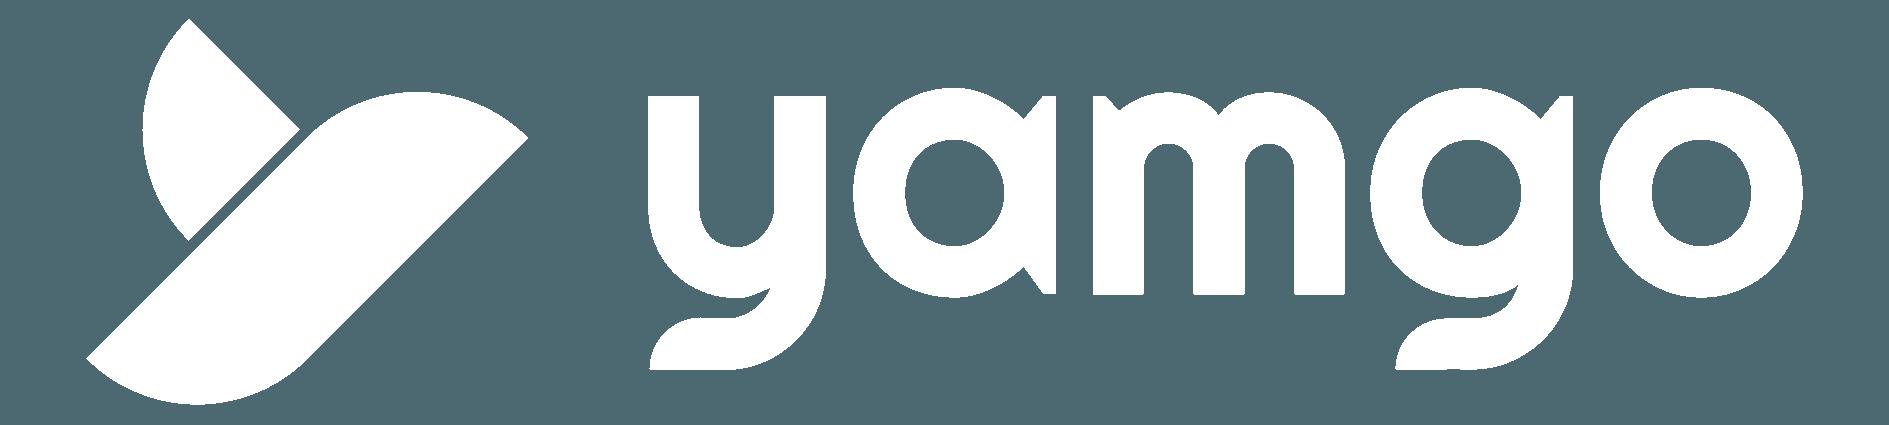 Yamgo owler 20210321 185231 original